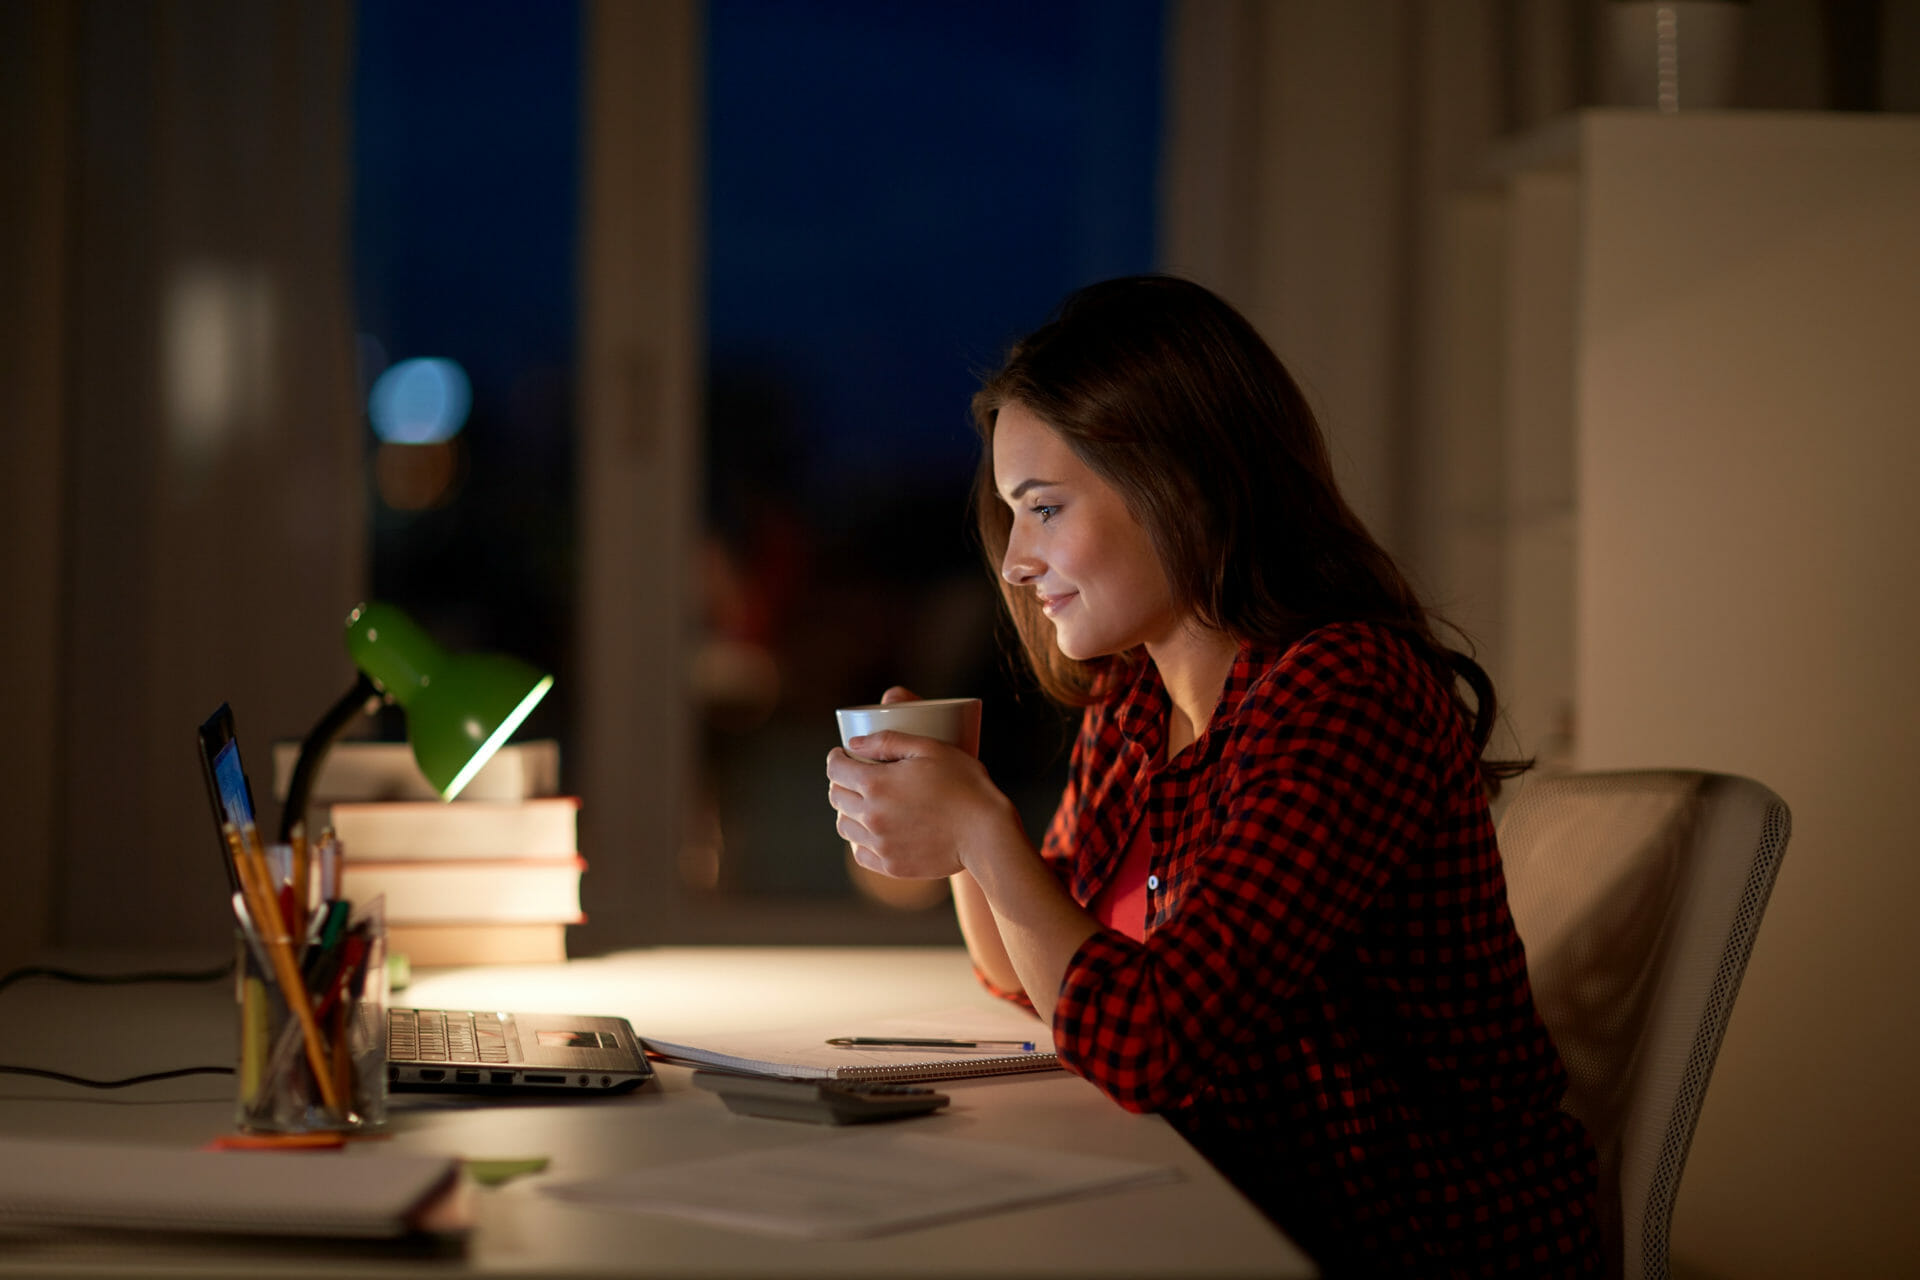 Woman drinking coffee at night